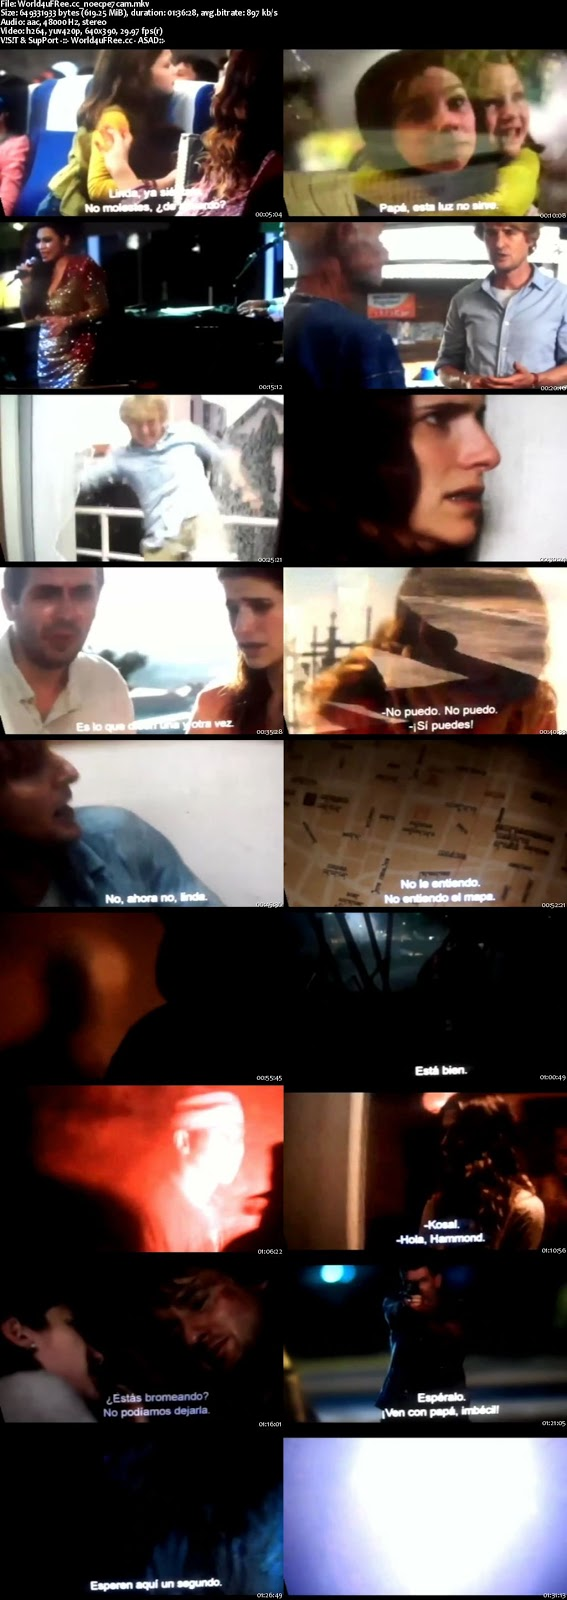 No Escape 2015 Hindi Dubbed CamRip 700mb world4ufree.cc